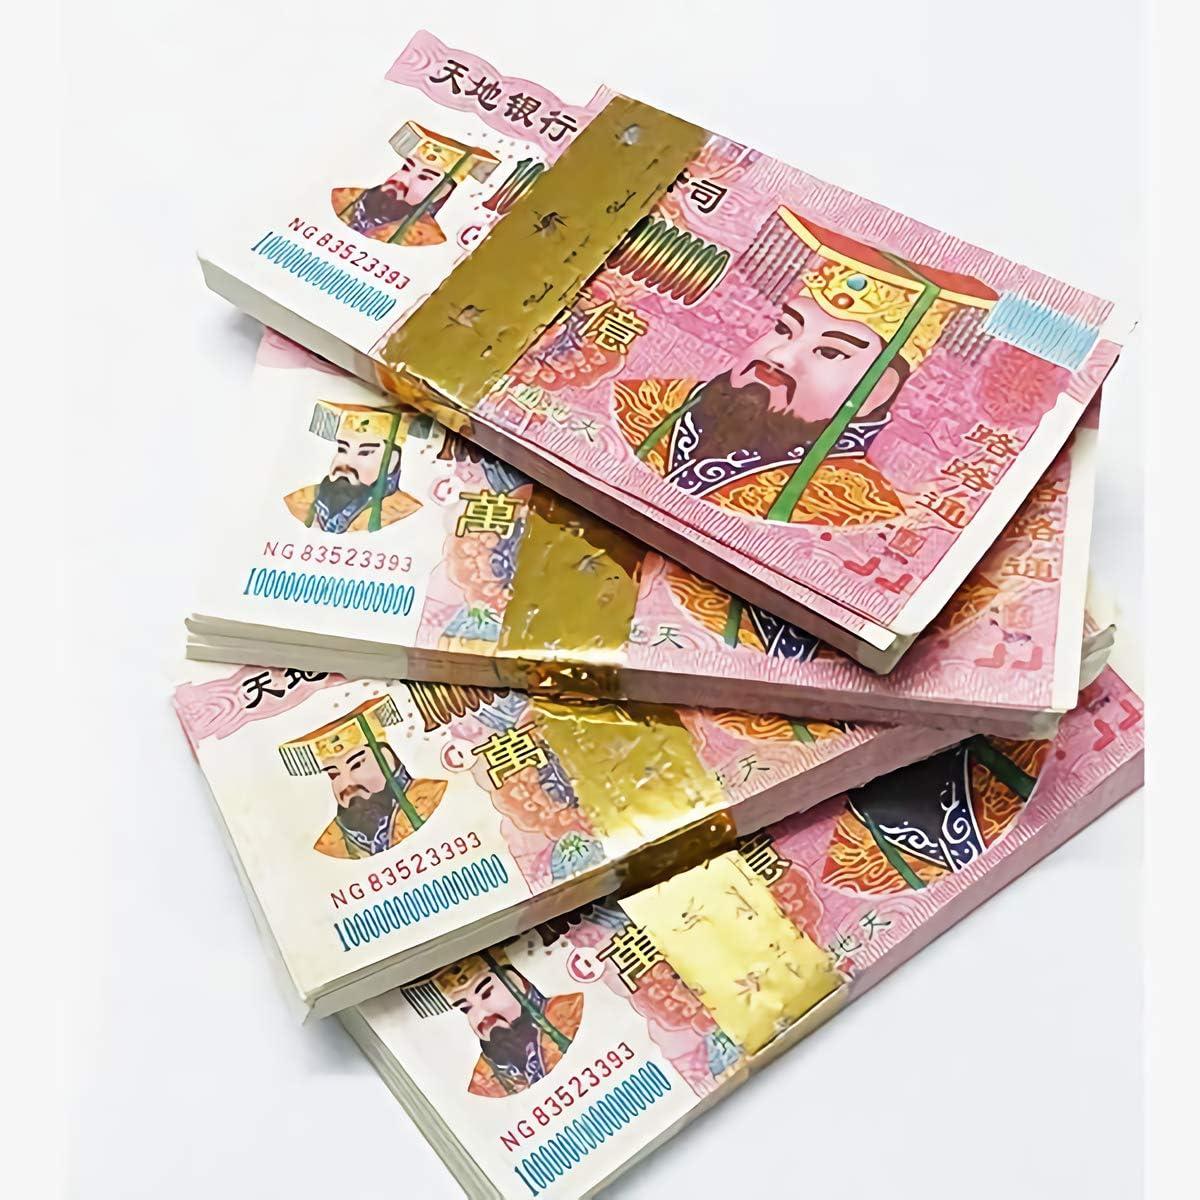 Ancestor Money Superlatite - 400 Piece Paper Joss Chinese Same day shipping M